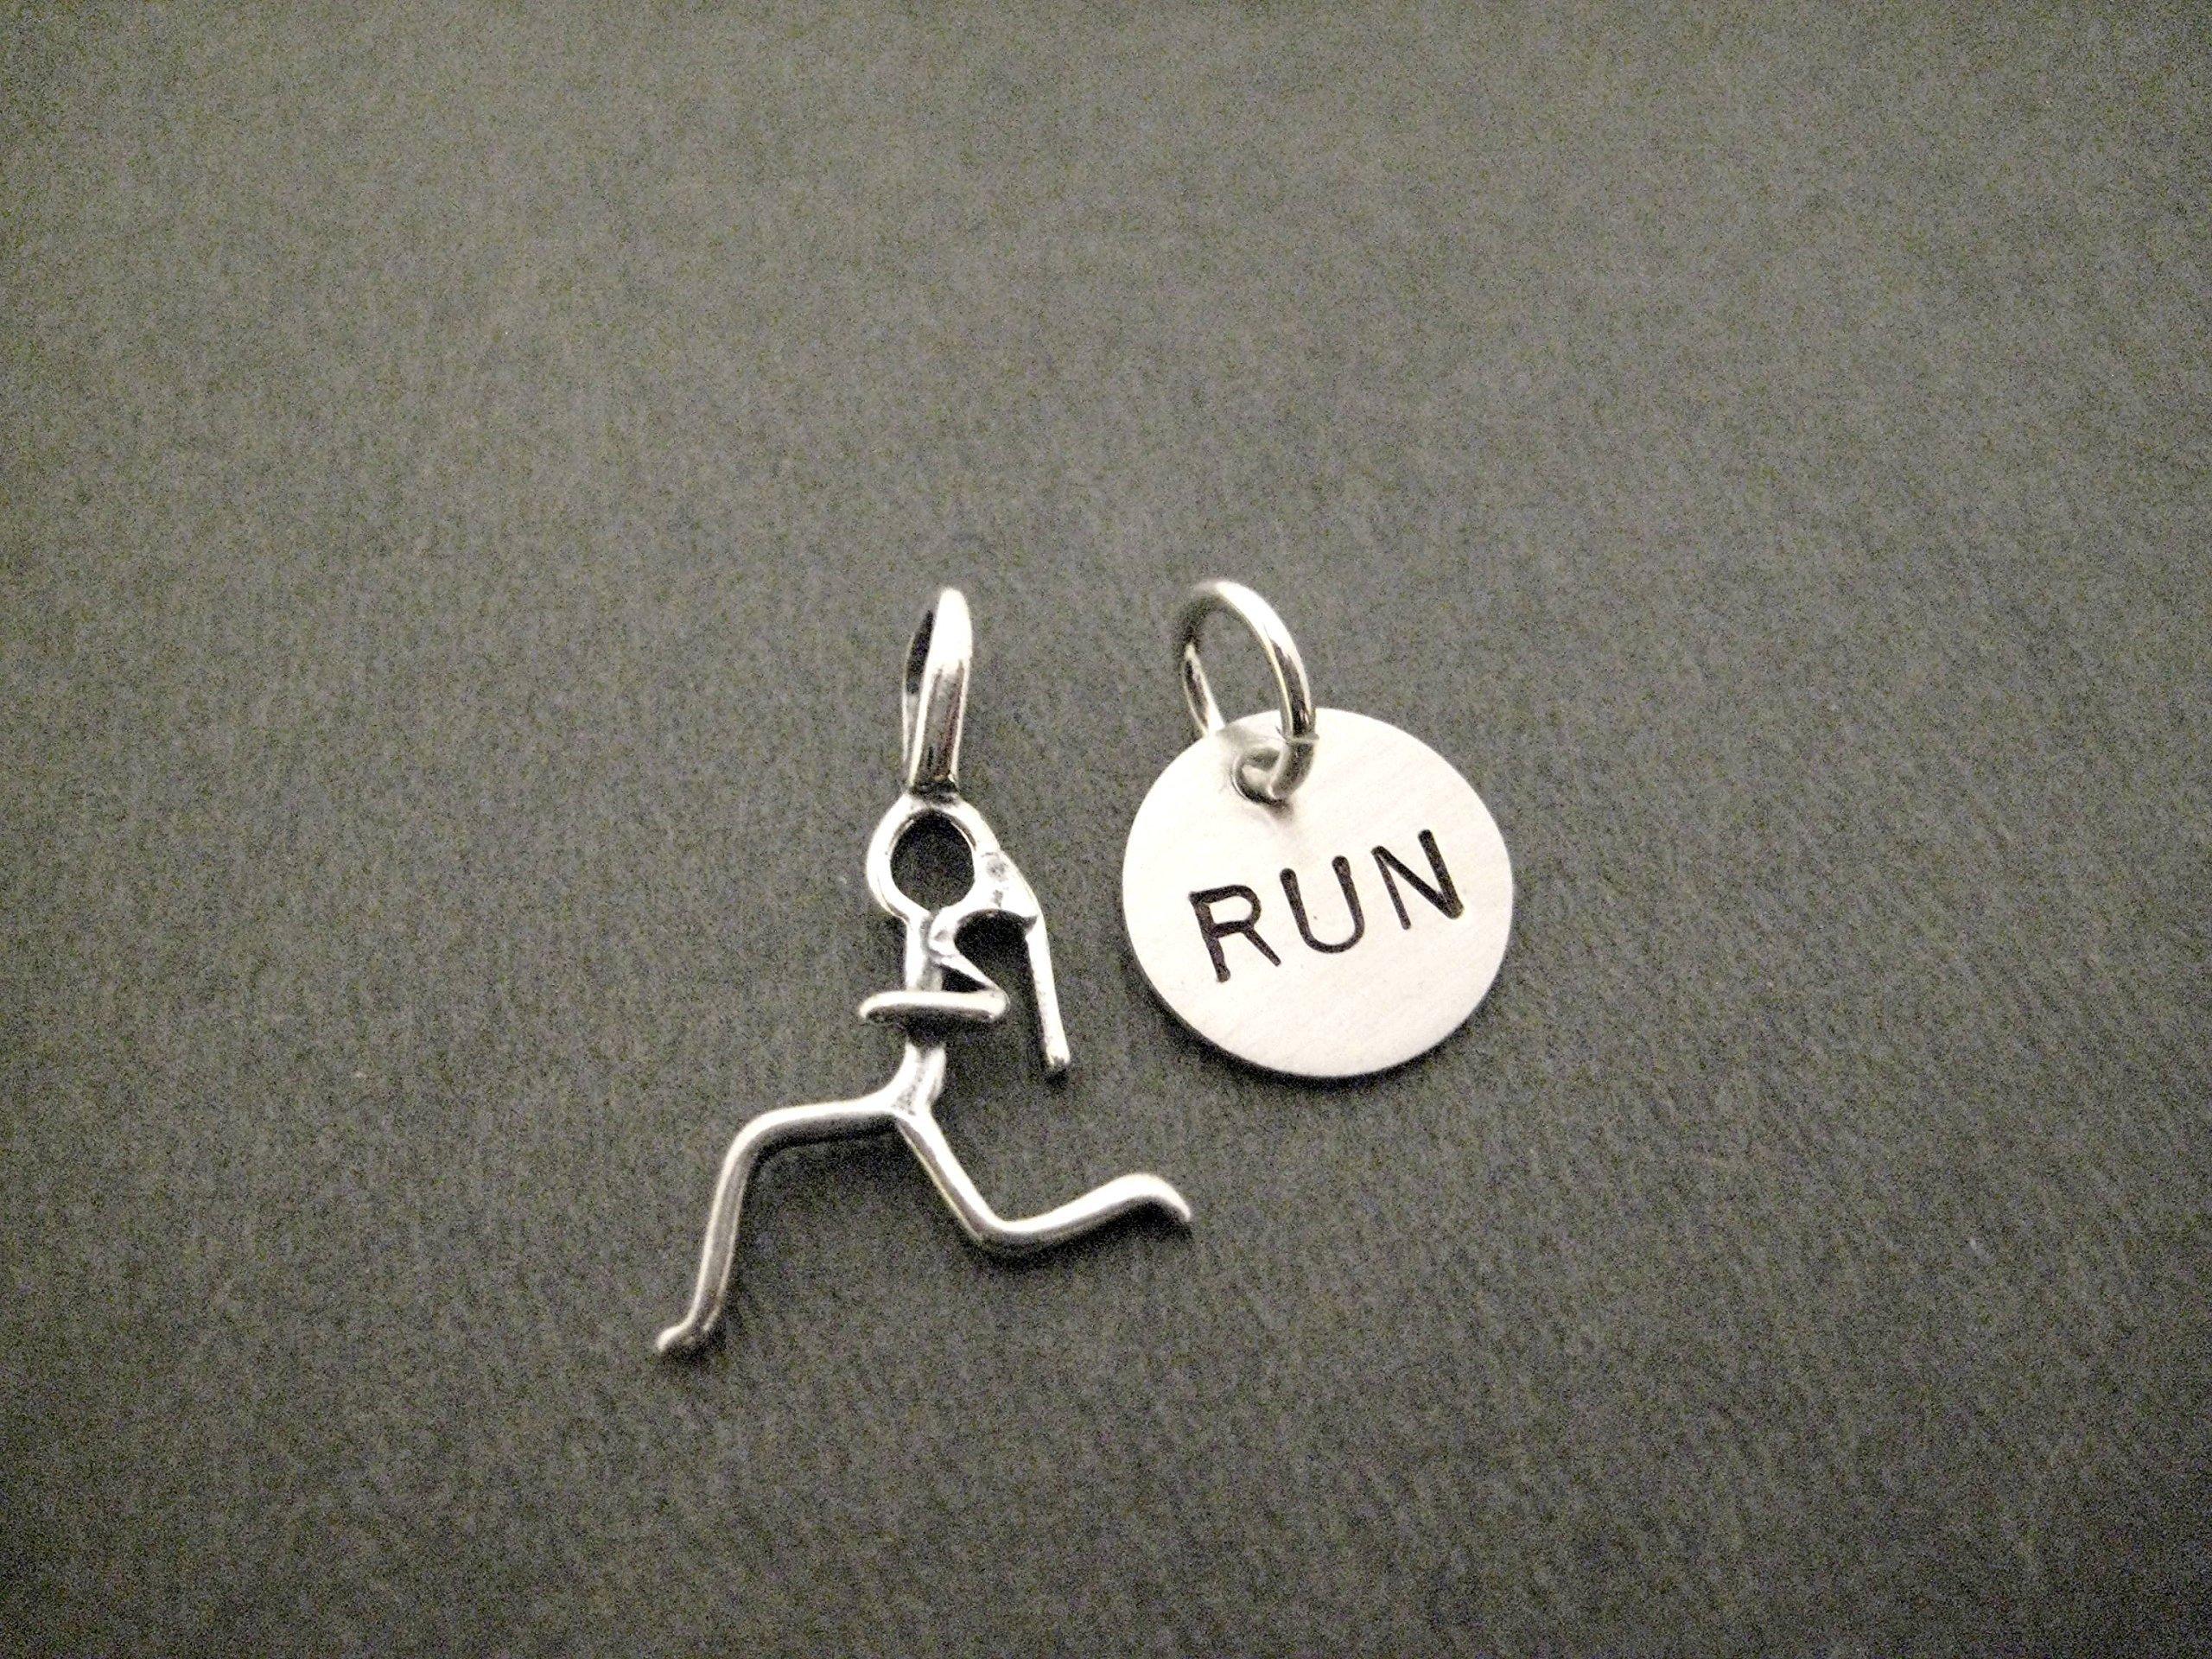 RUNNING Girl RUN Charm Set - Sterling Silver Runner Girl Charm Plus Hand Stamped Sterling Silver RUN Charm in Organza Bag